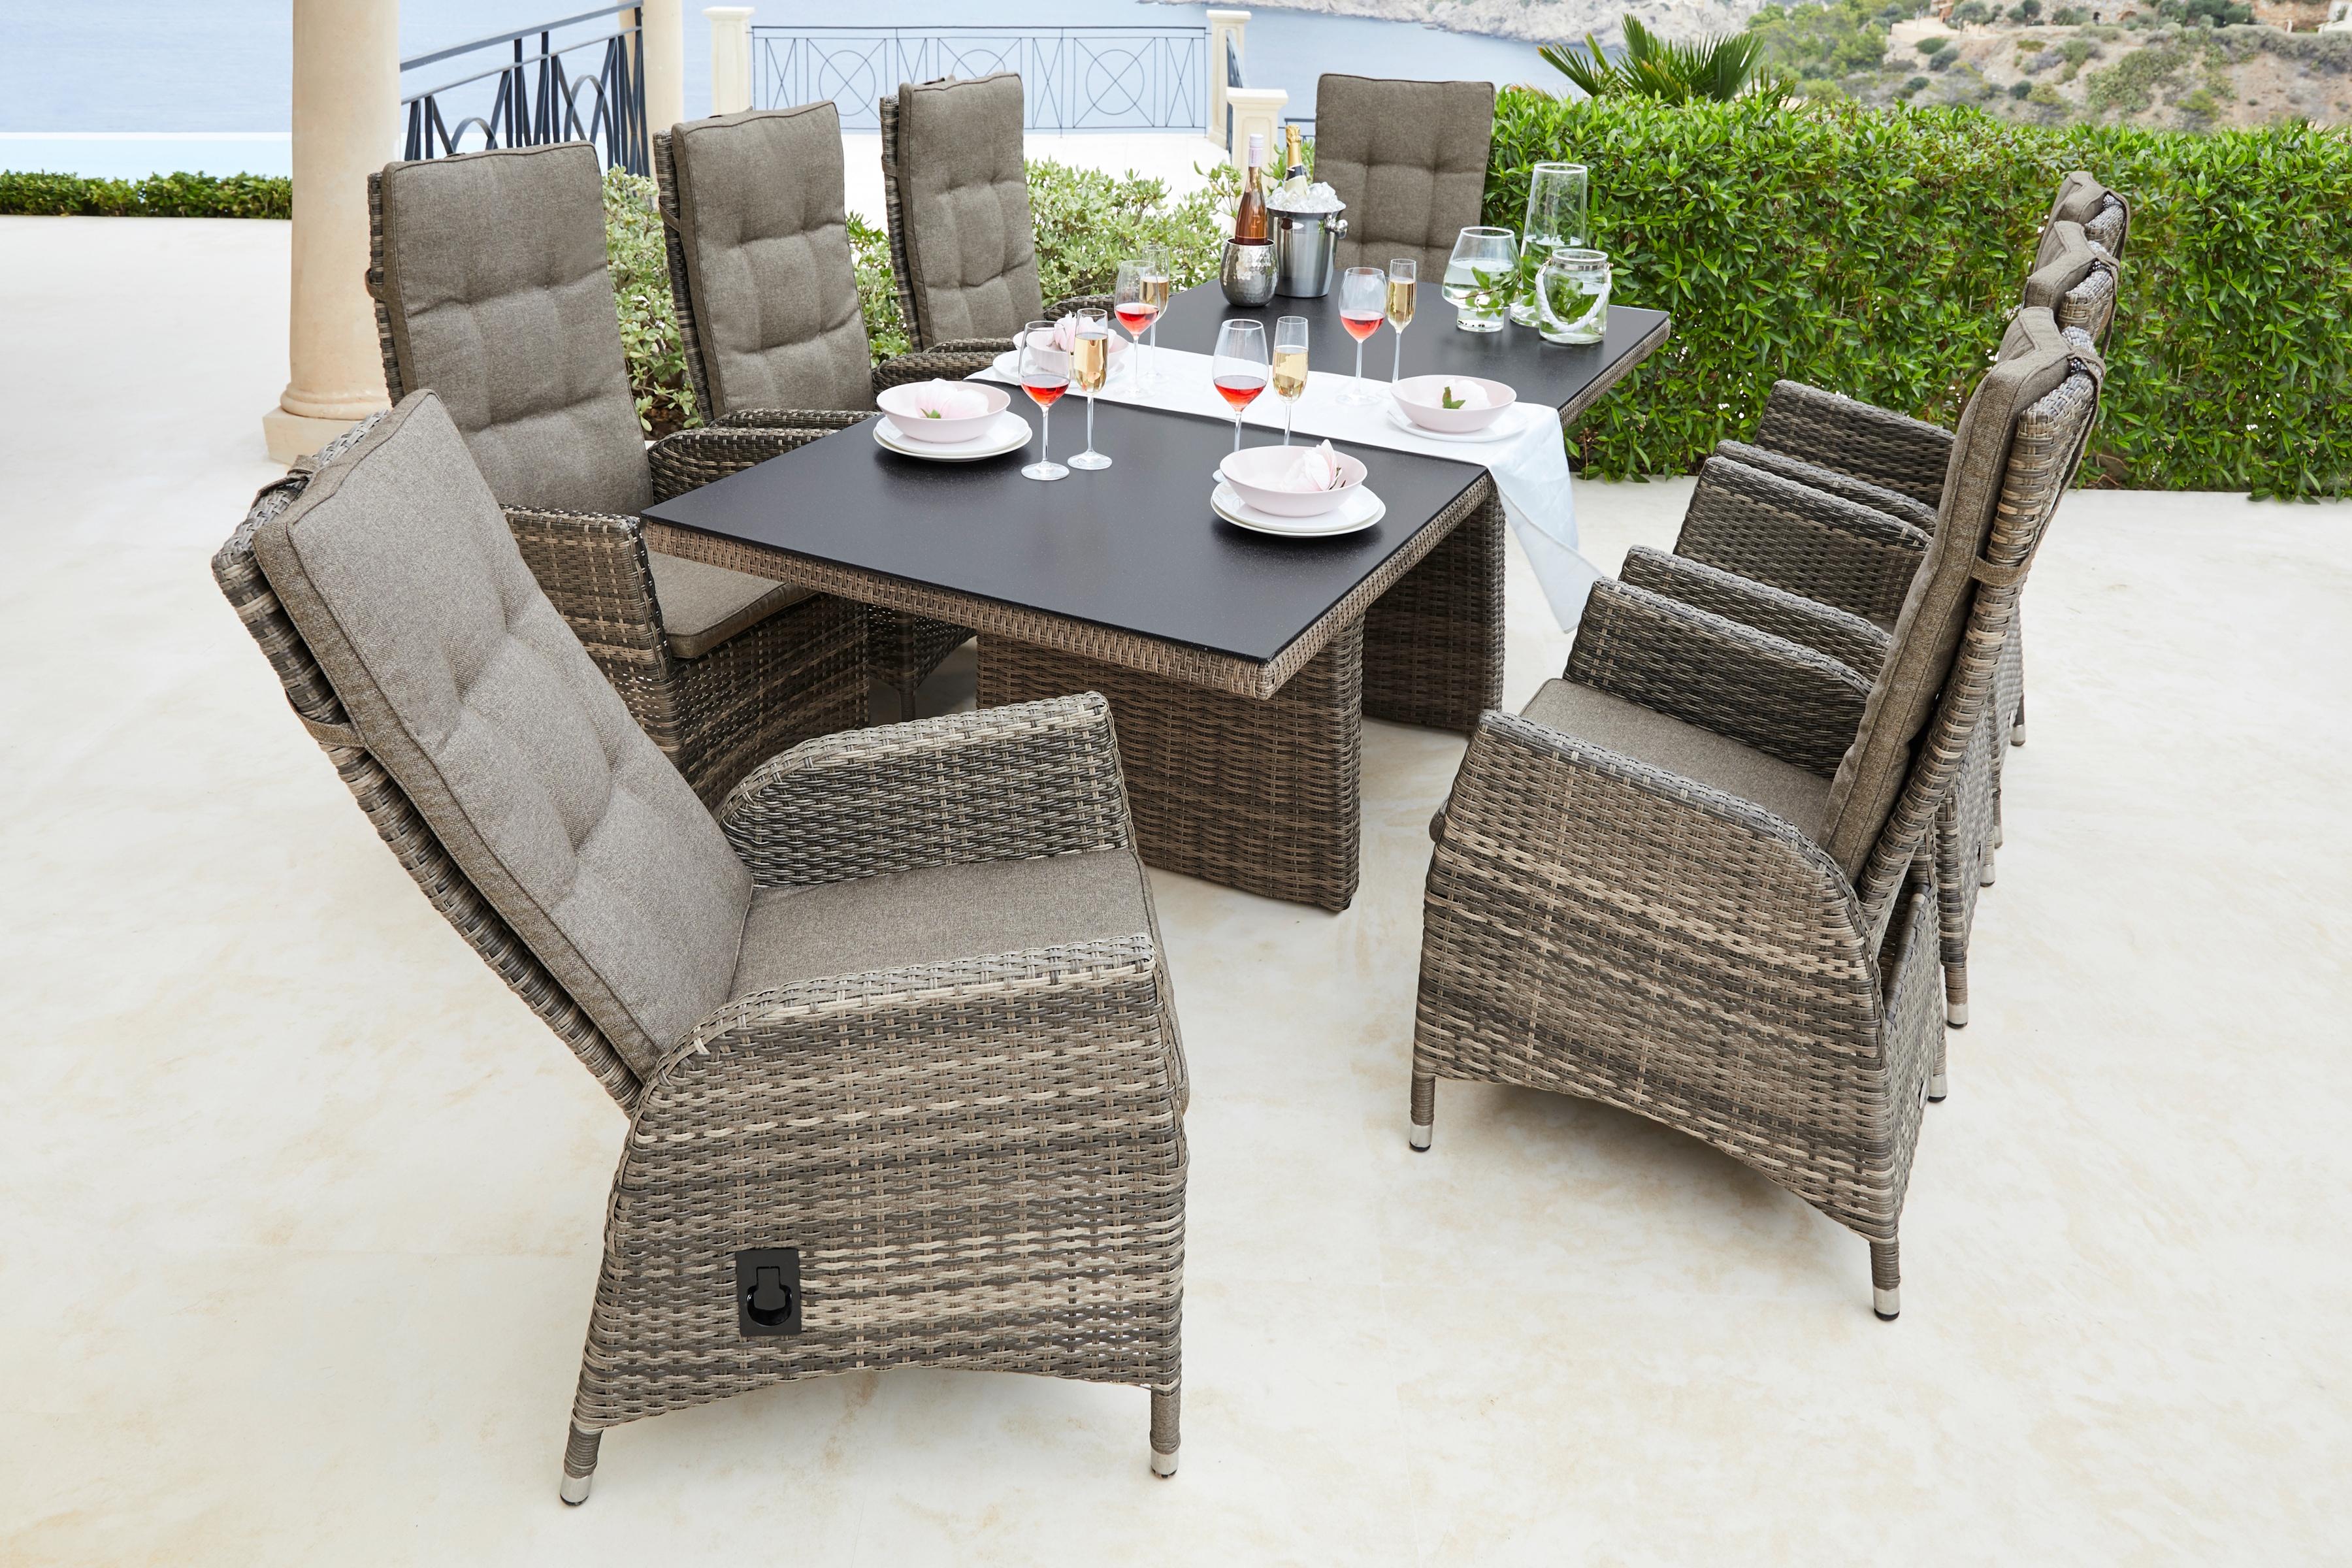 PLOSS Diningset Tokio 17-tlg 8 Sessel Tisch 100x220 cm Polyrattan braun